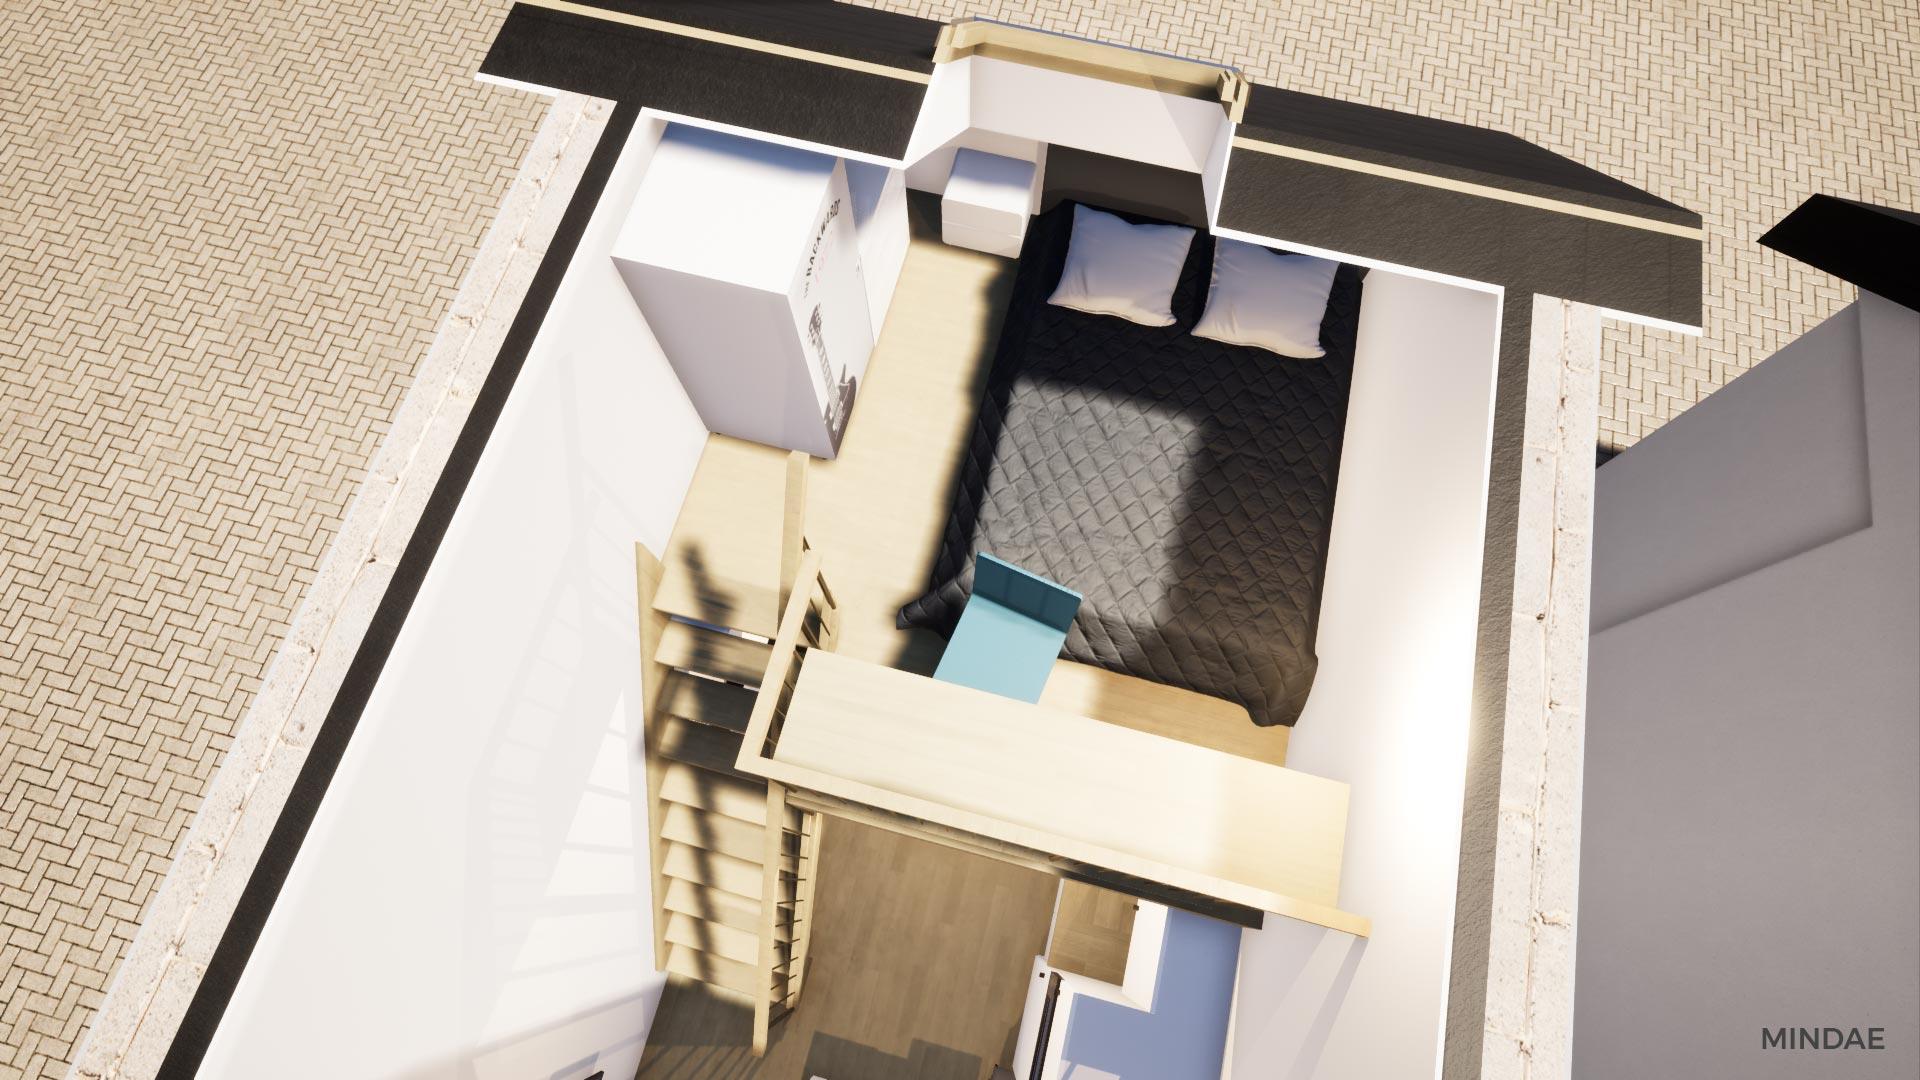 Mindae_3D_as_immobilier_projet_A_garage_duplex_studio_investisseur_caen-(7)